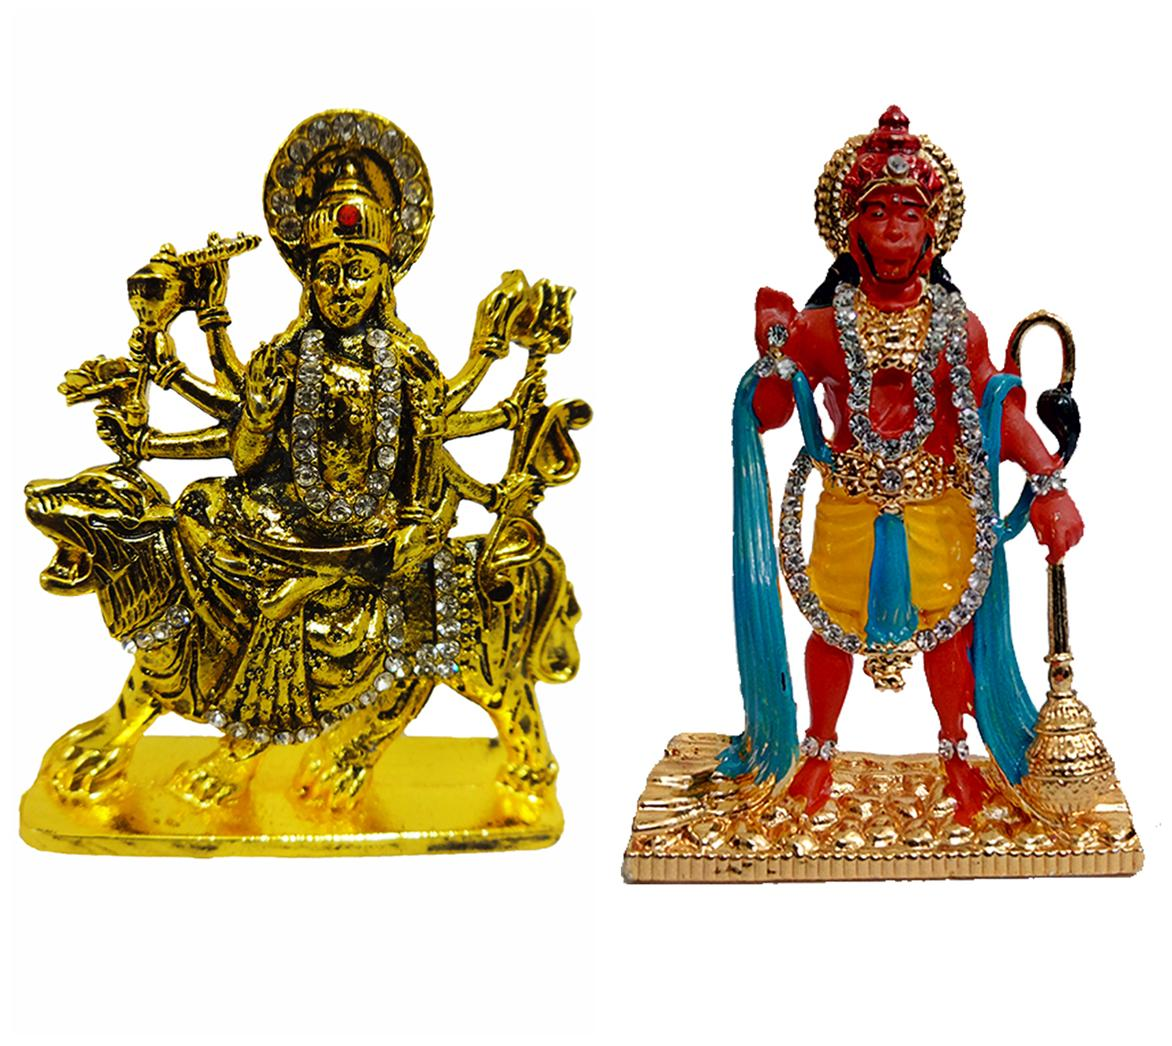 Fabzone Goddess Durga Devi & Hanuman Car Dashboard Idol Statue Spiritual Puja Vastu Showpiece Figurine - Religious Murti Pooja Gift Item